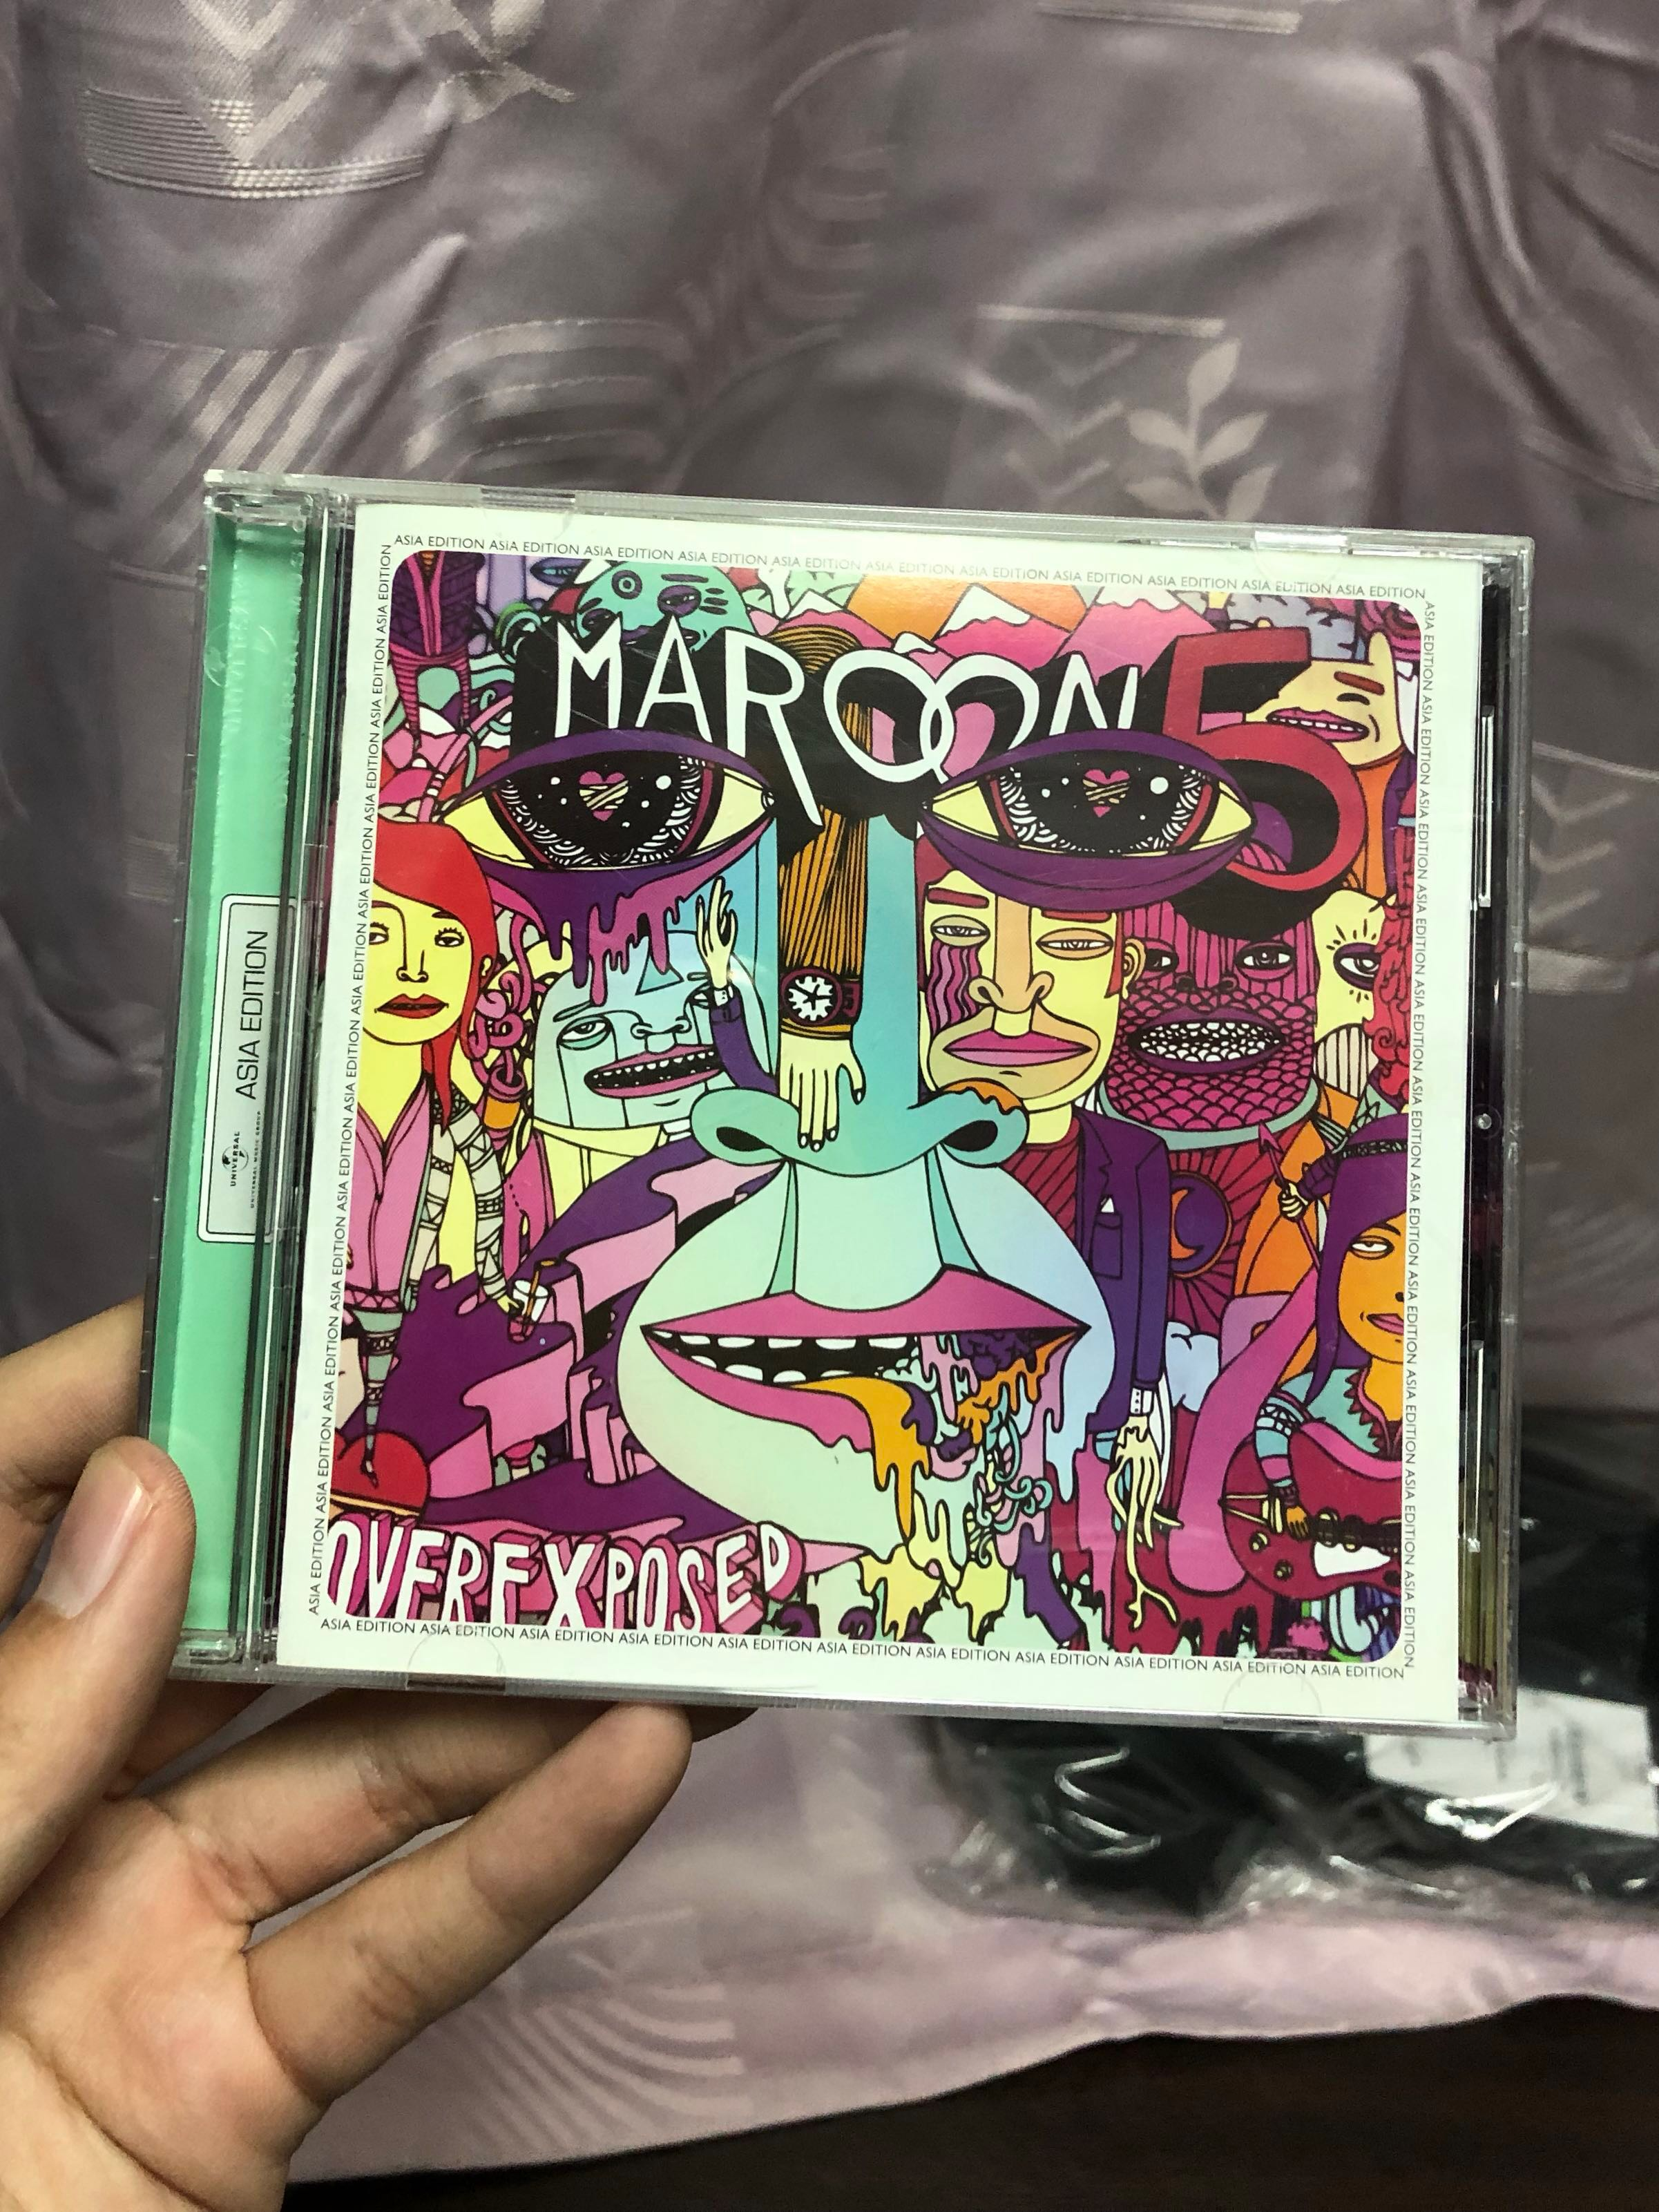 maroon 5 overexposed (deluxe version)